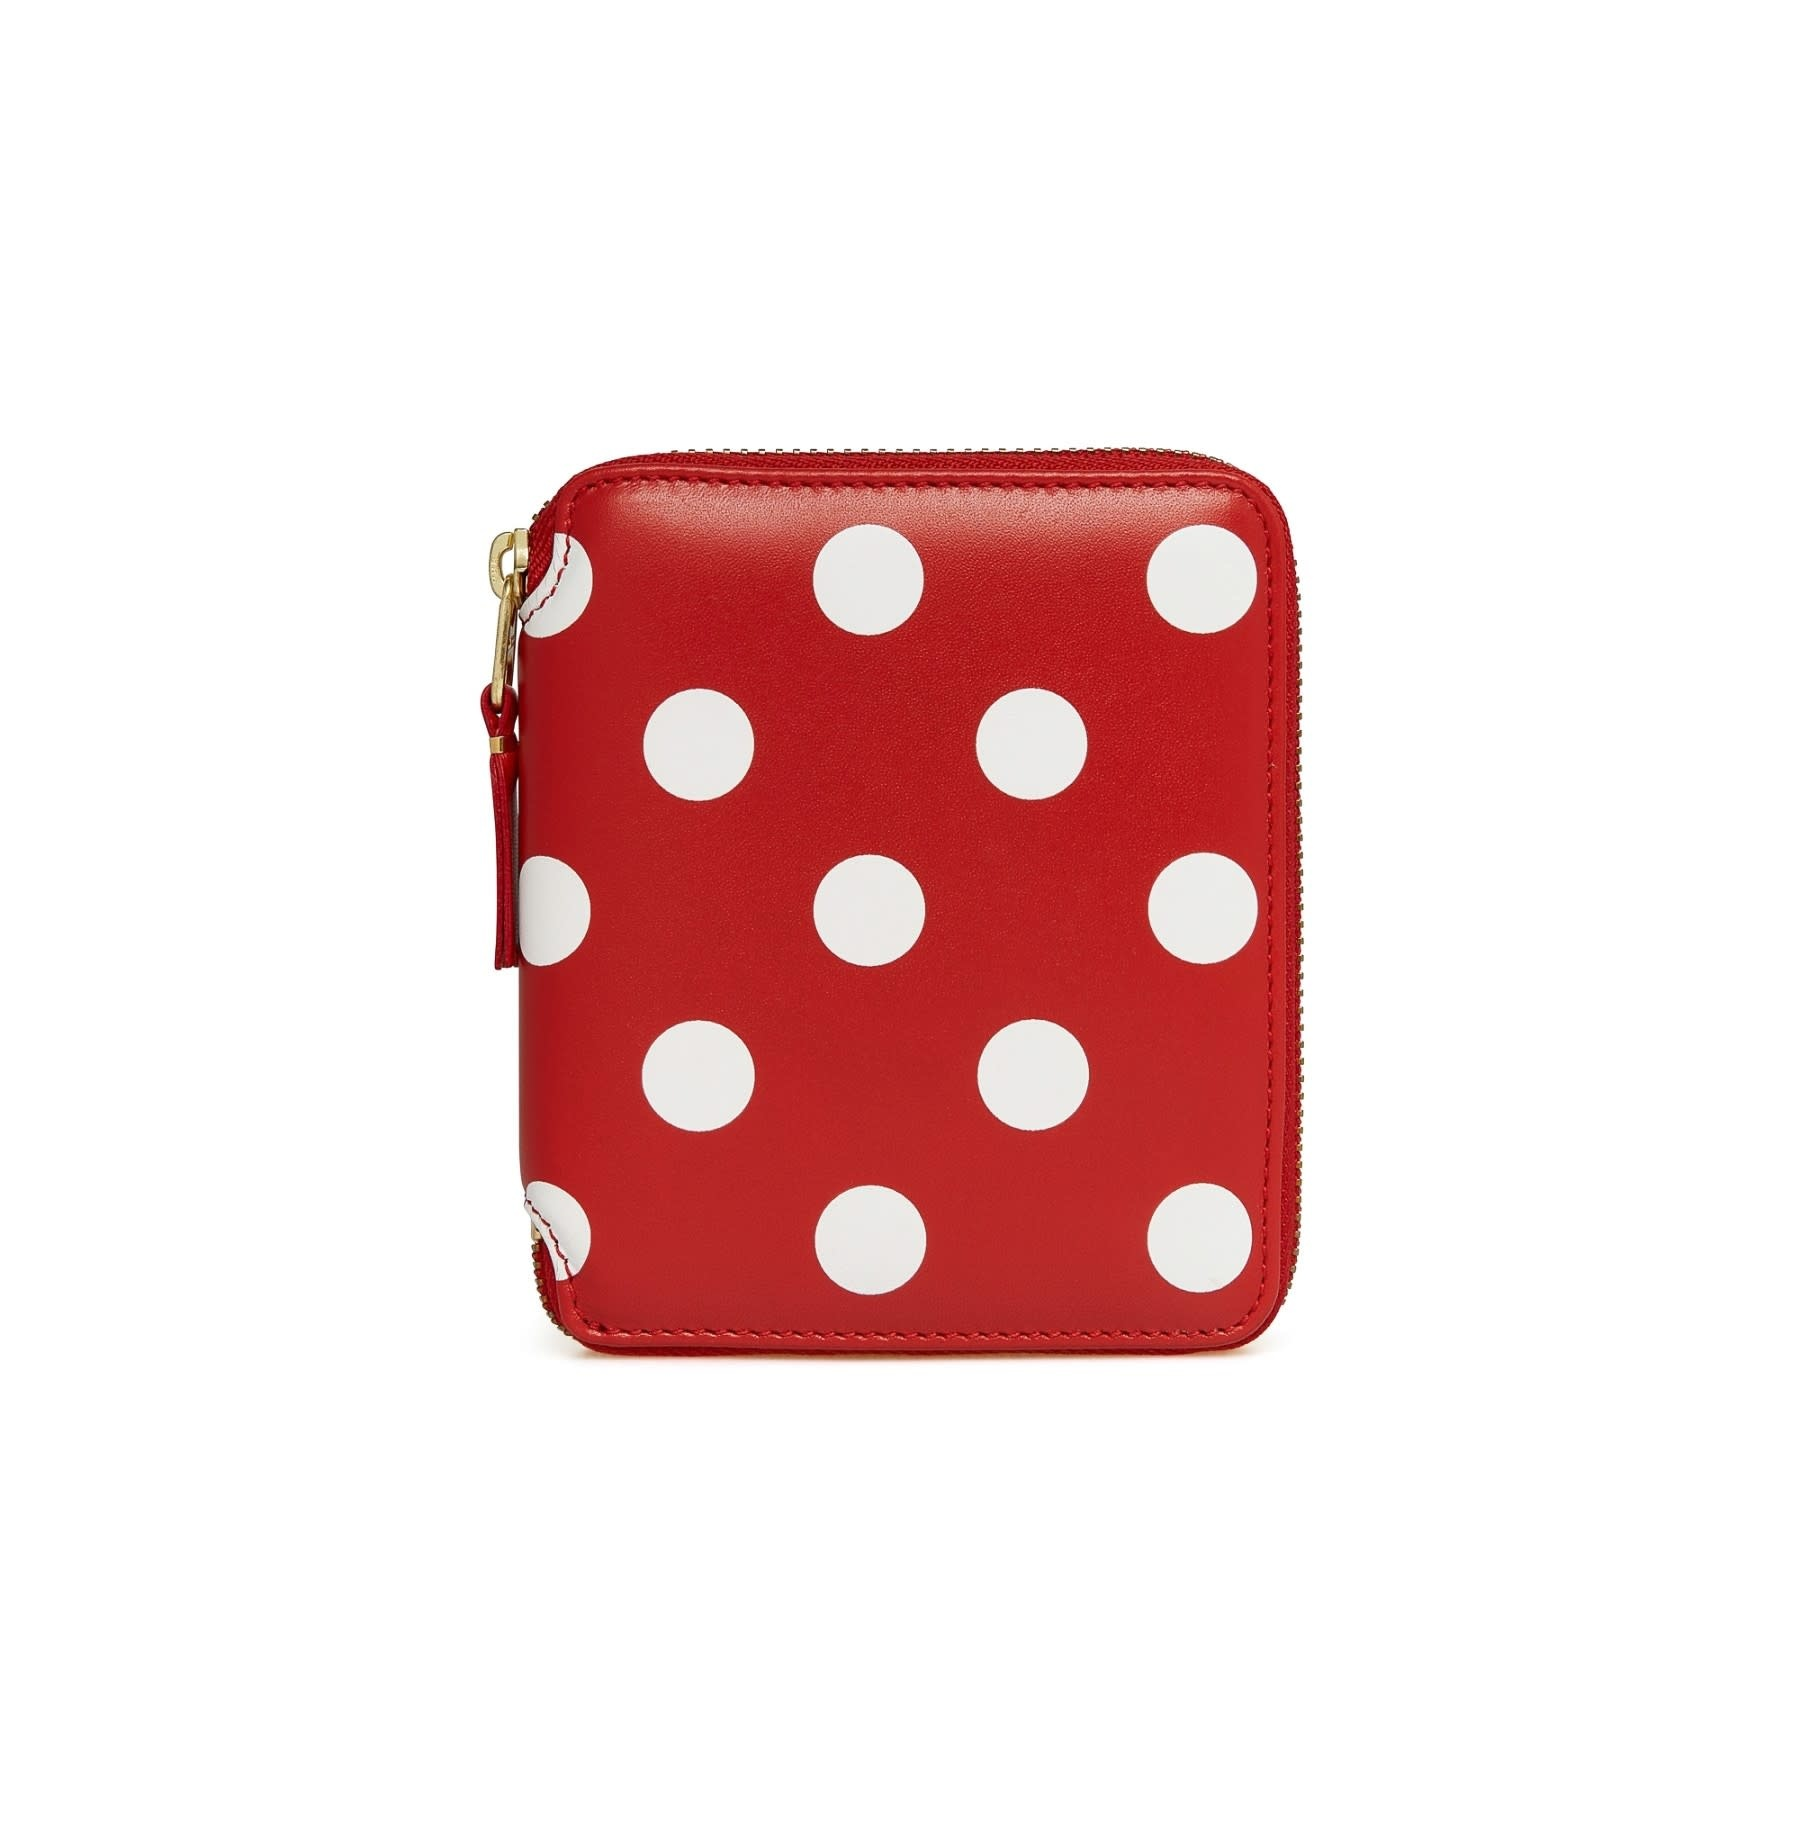 COMME des GARÇONS Wallet Full Zip Medium Wallet Polka Dot Red/White SA2100PD